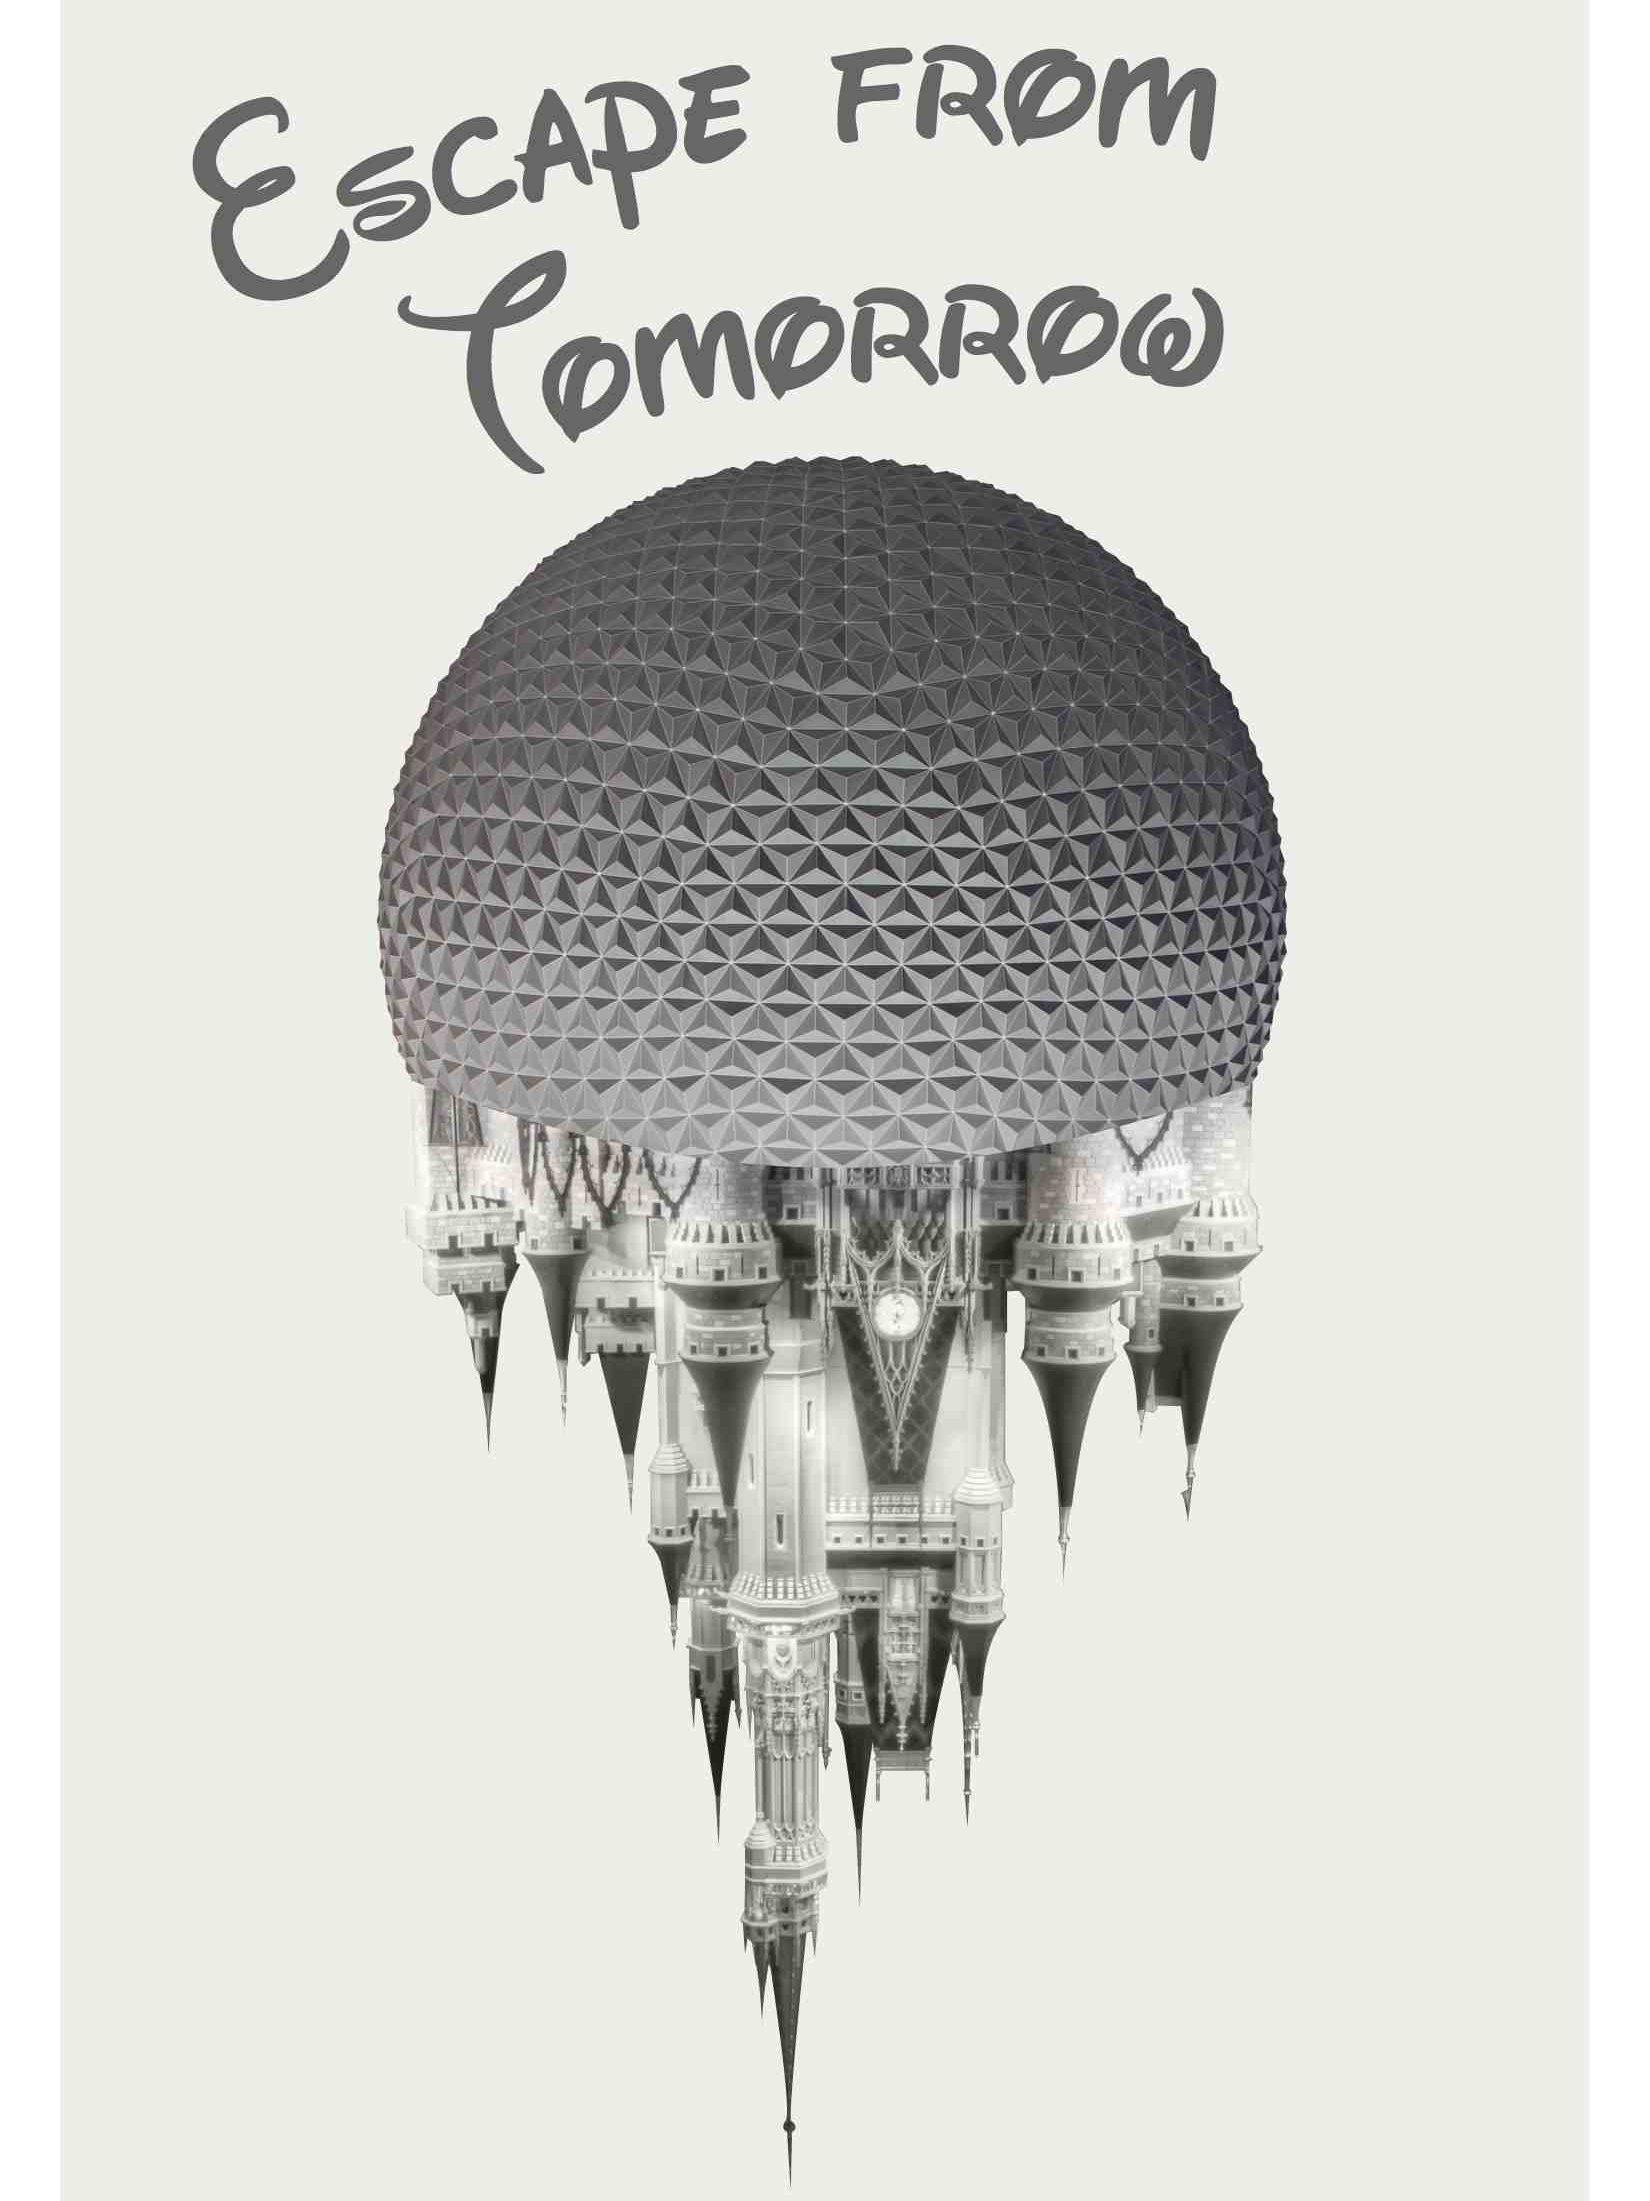 escape from tomorrow poster crazydiscostu film review nerd geek